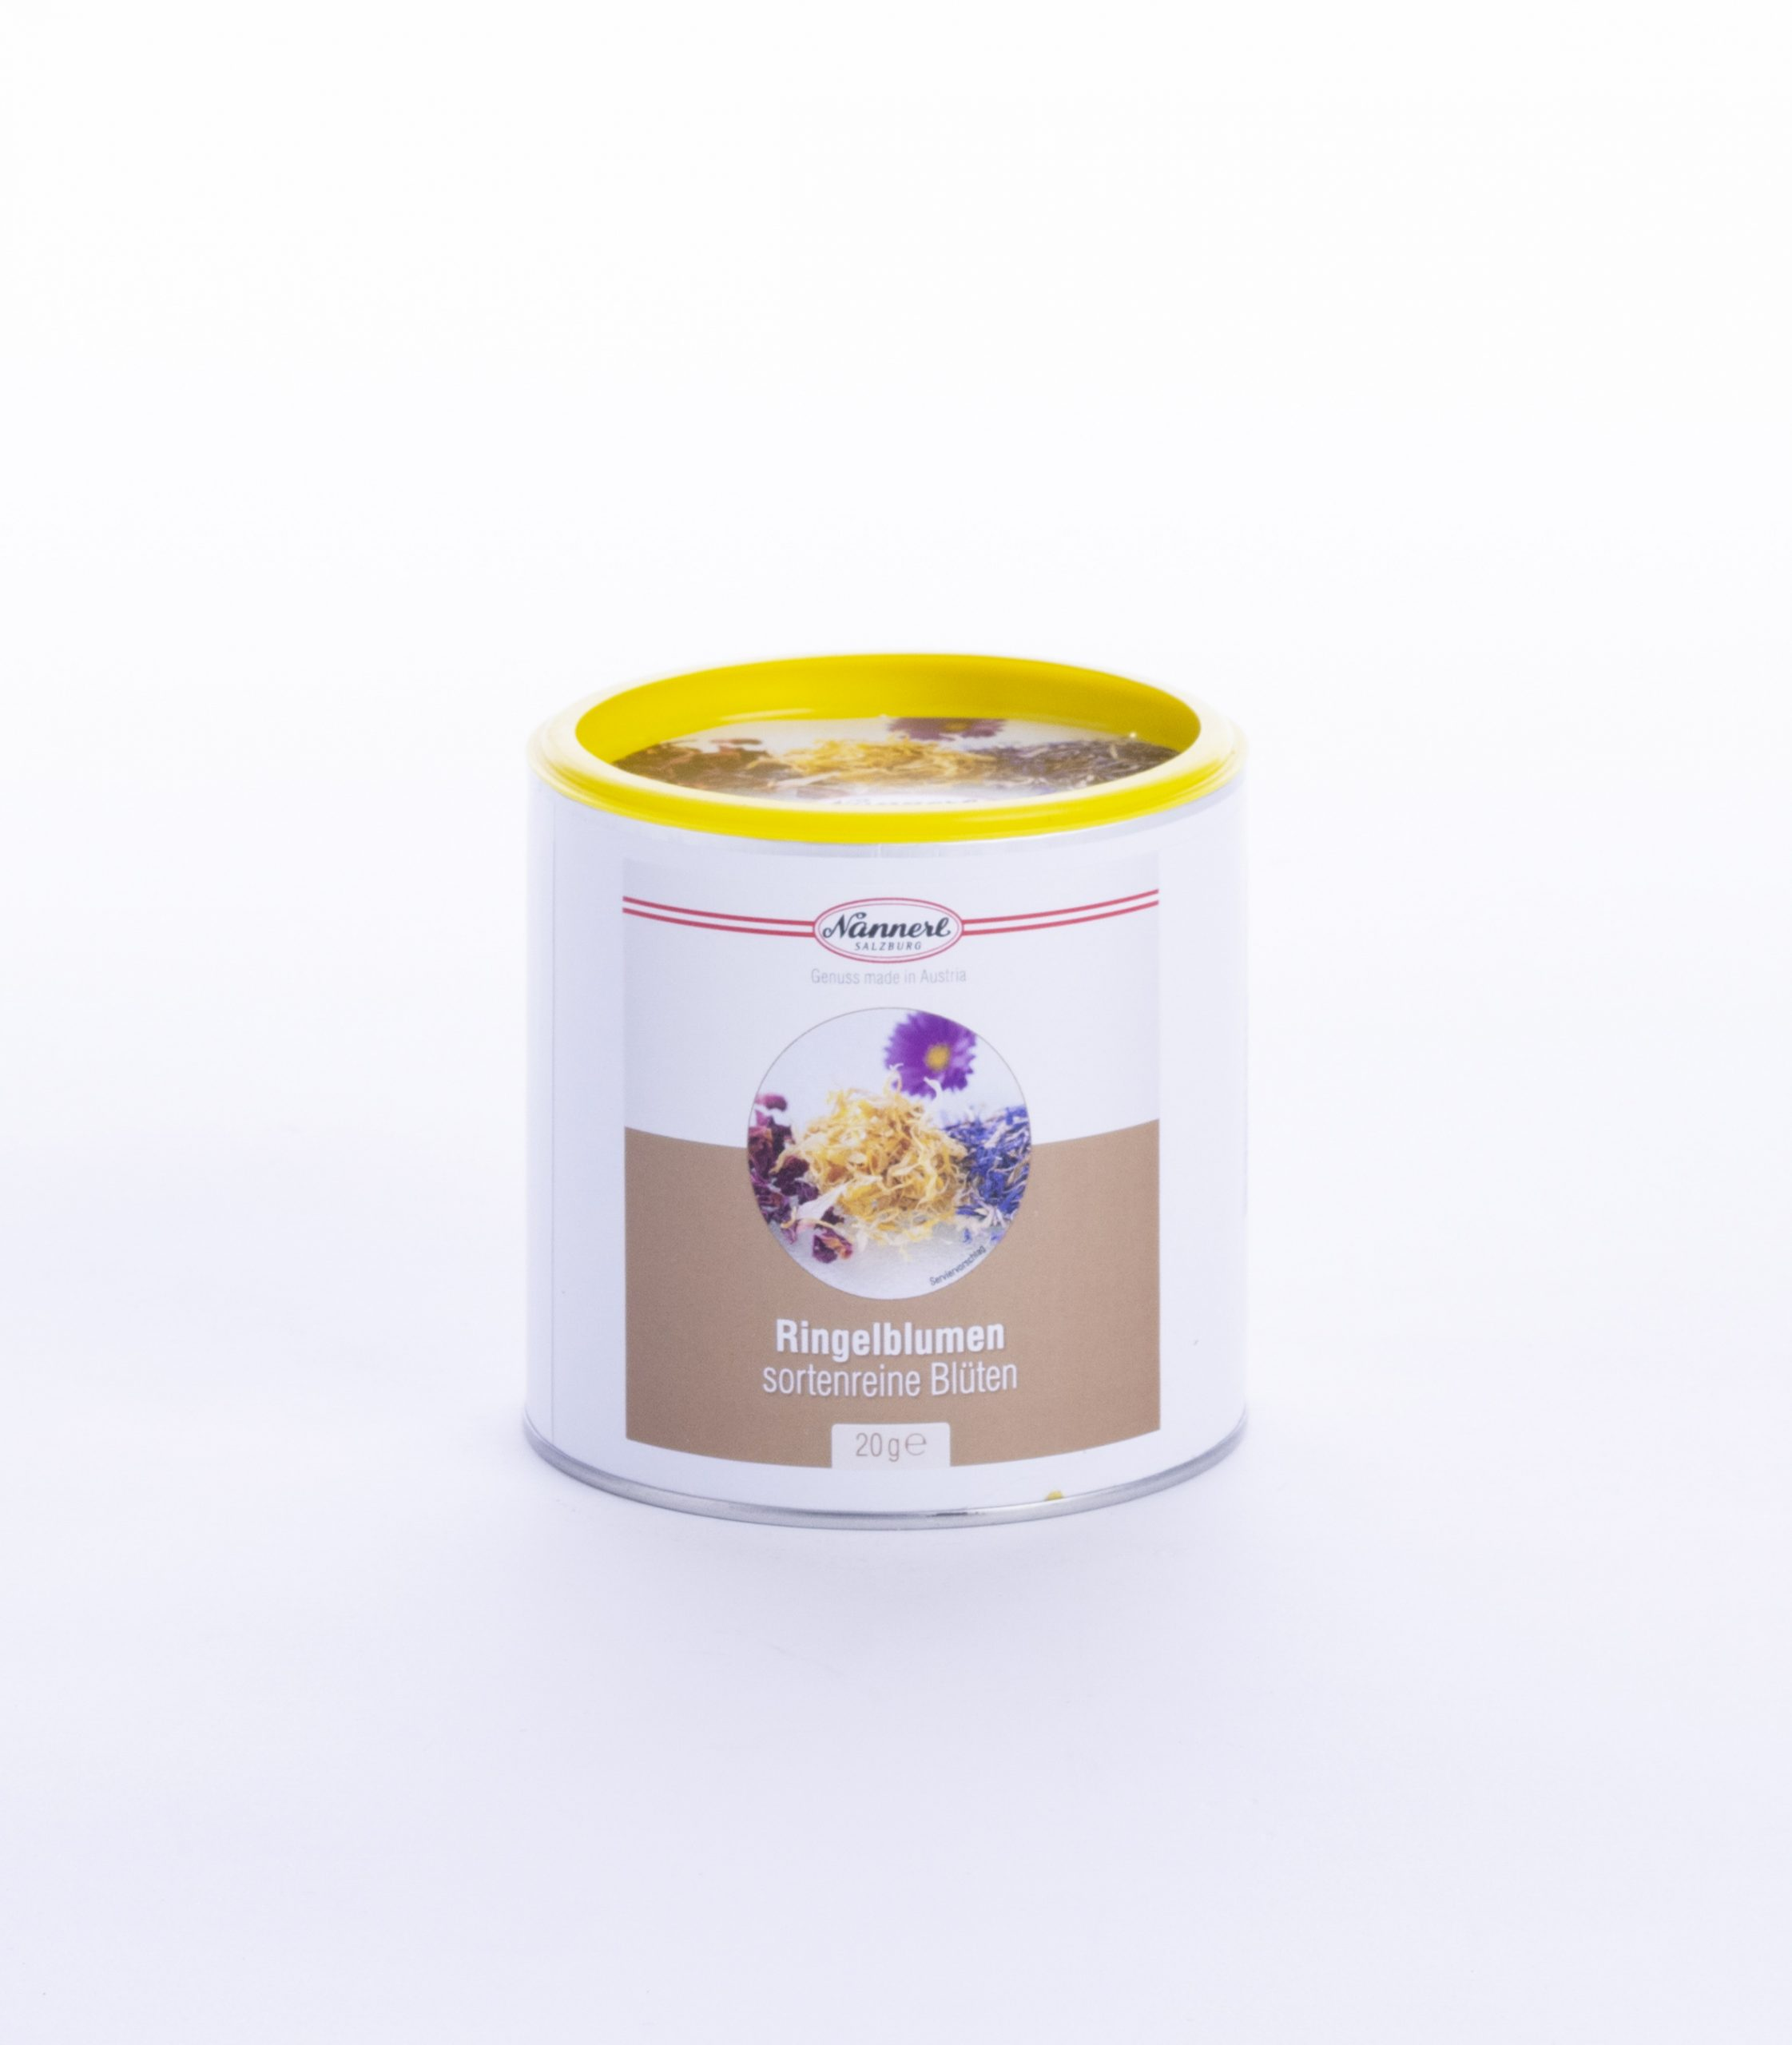 Nannerl GmbH & Co KG Produkt